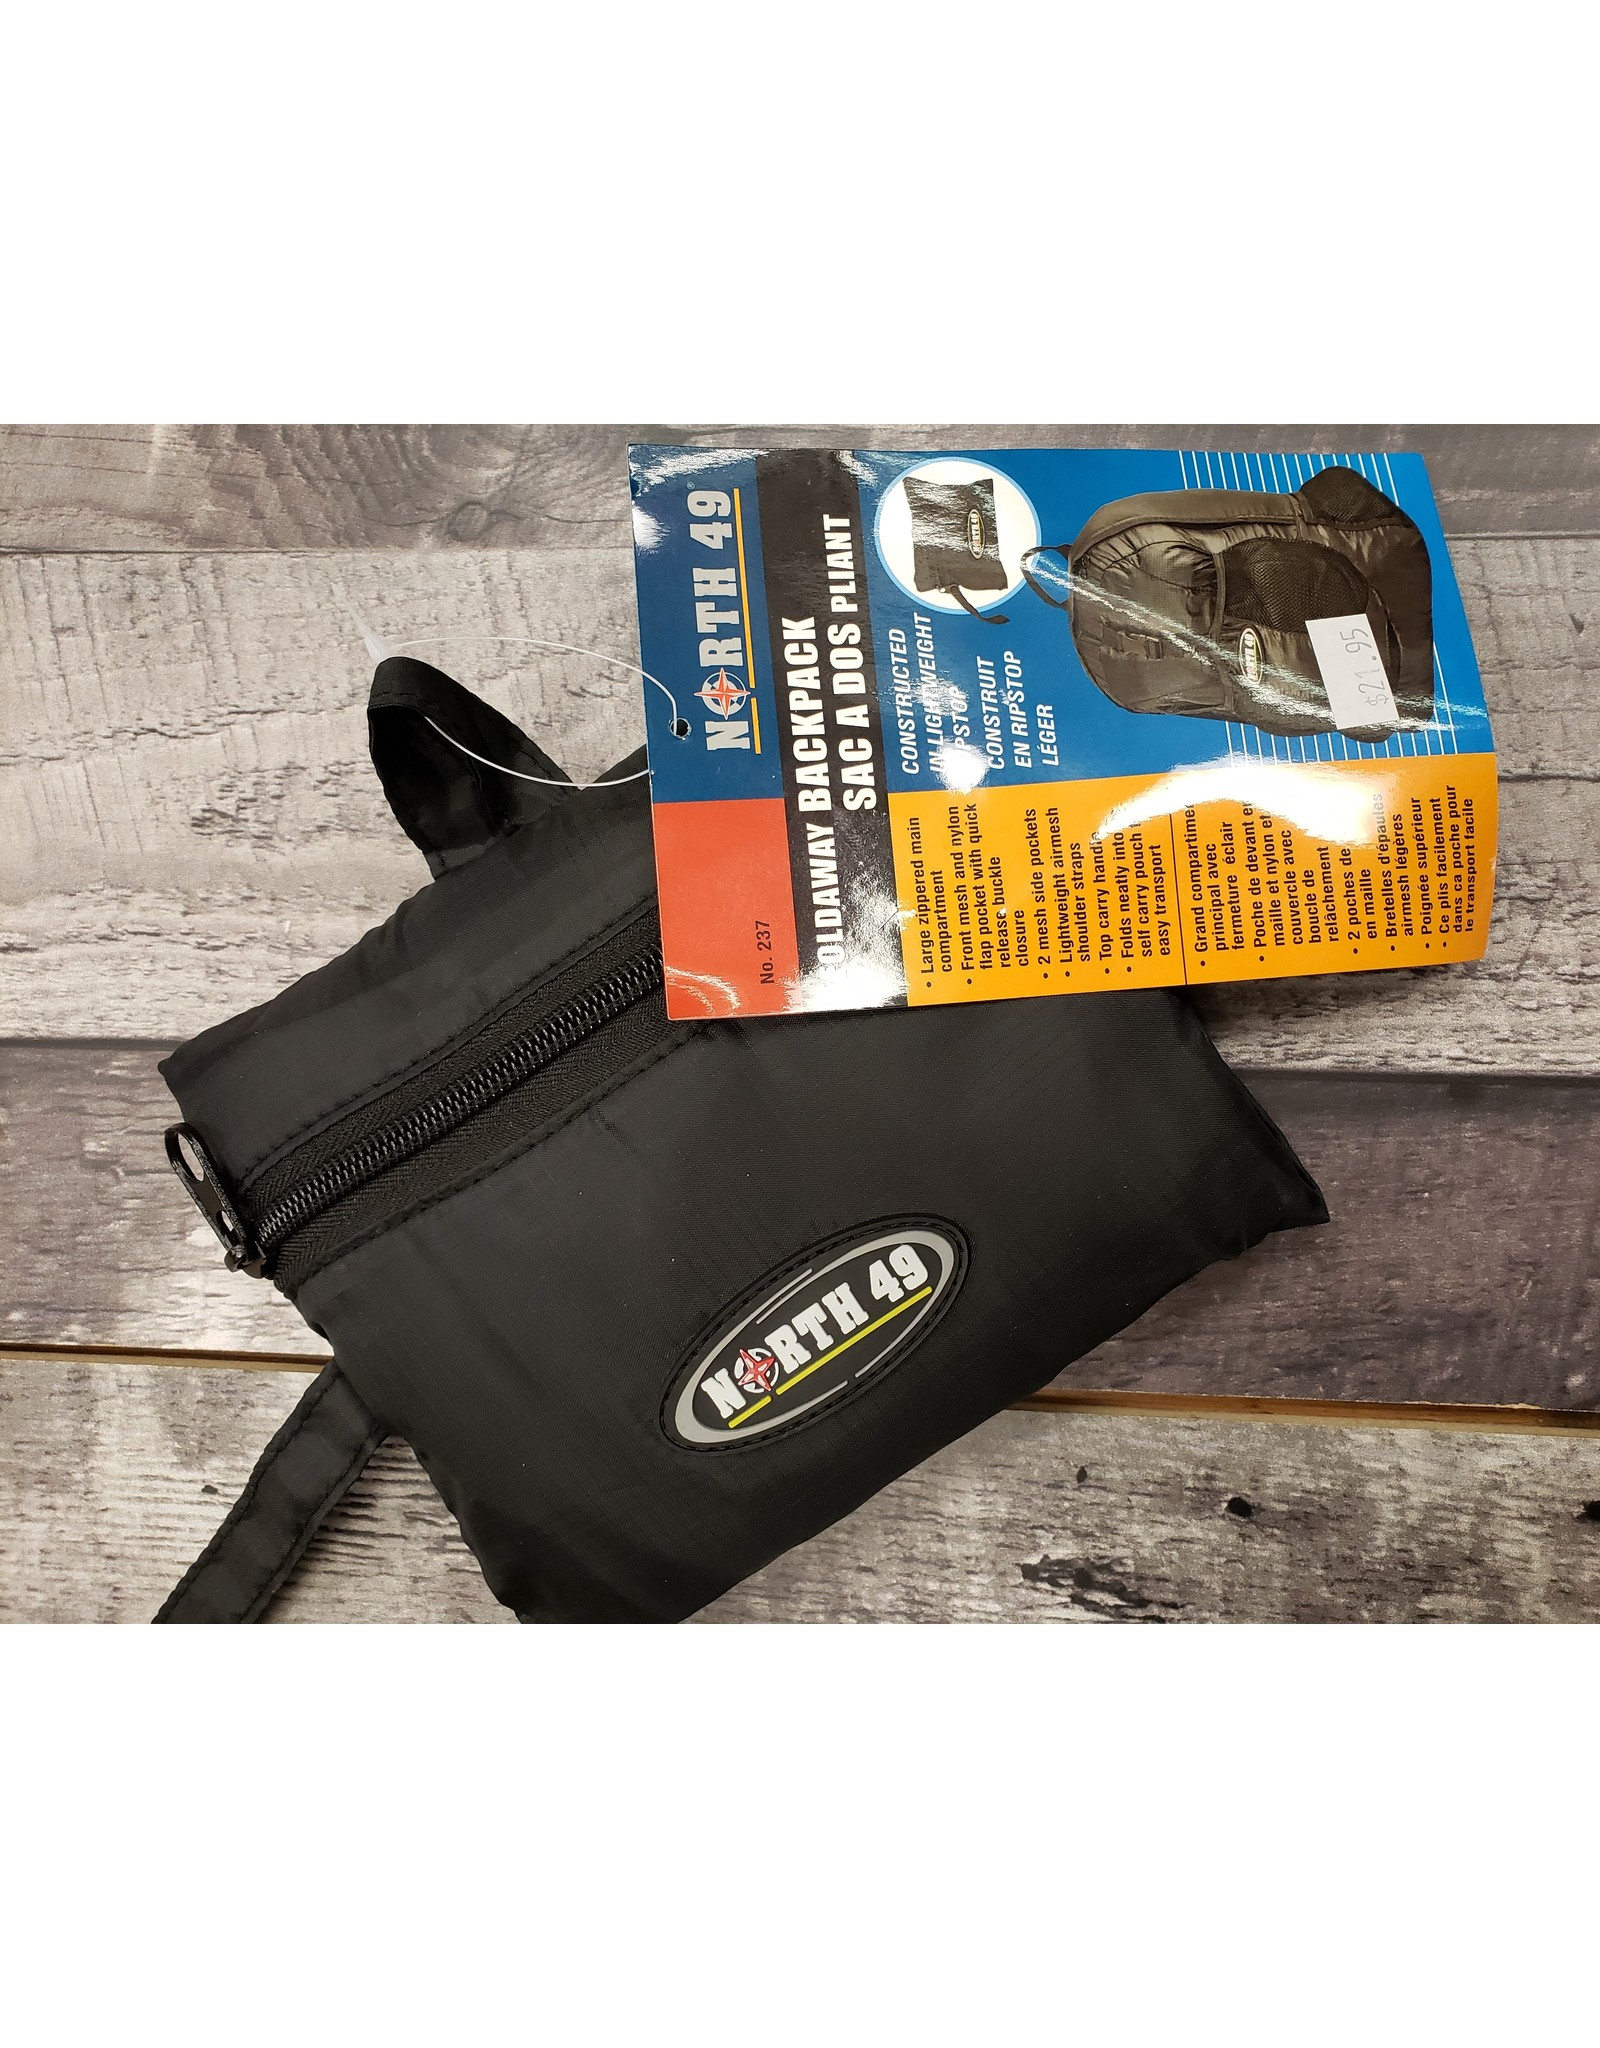 NORTH 49 North 49 - Foldaway Backpack - Black